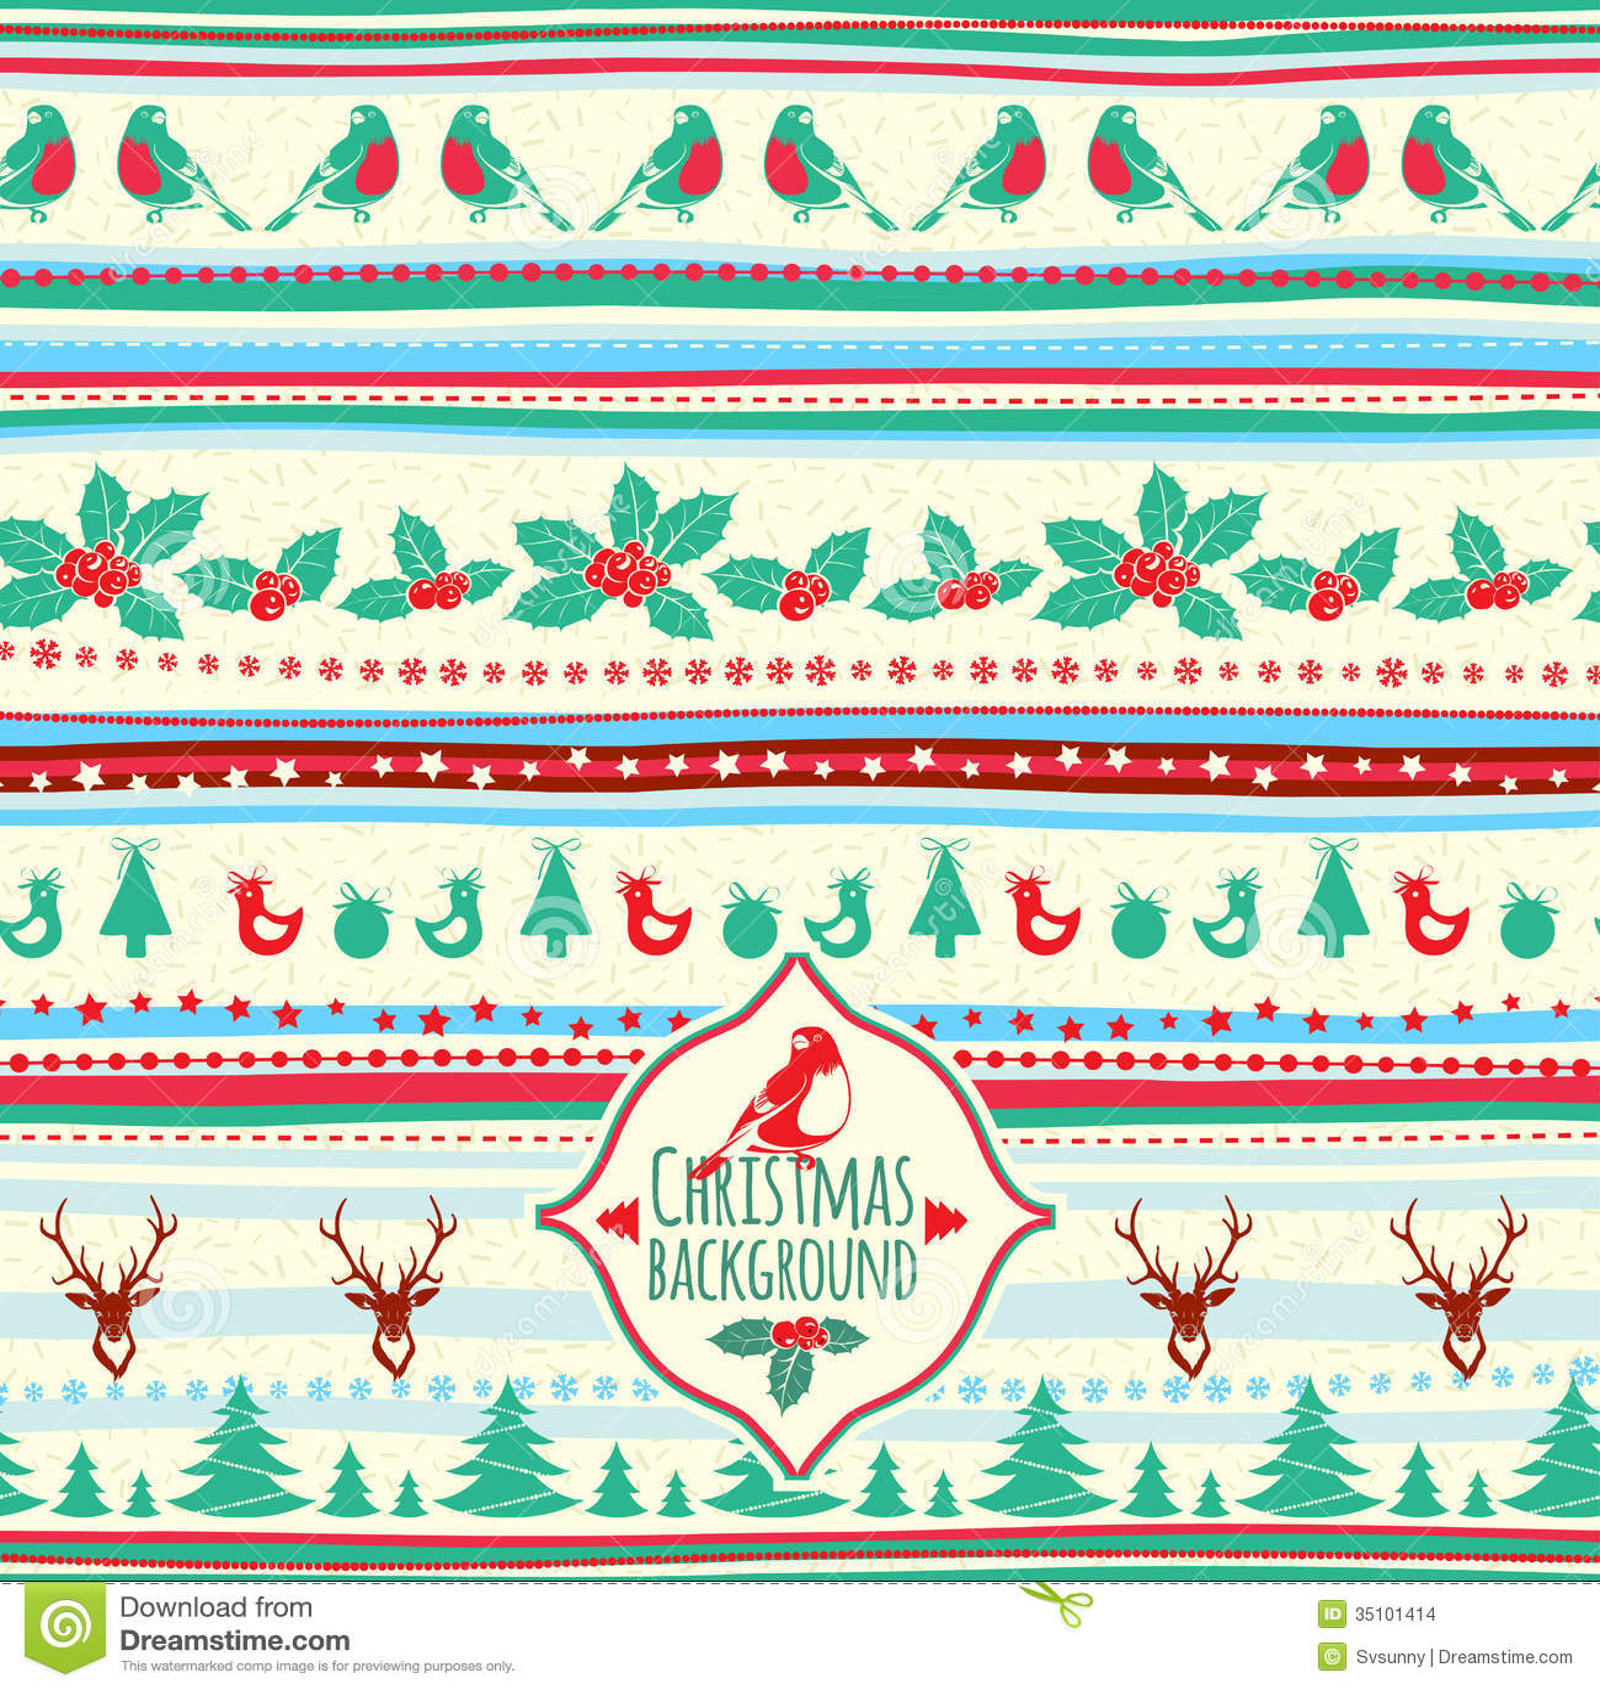 Vector illustration of Vintage Christmas pattern Vintage Christmas Pattern